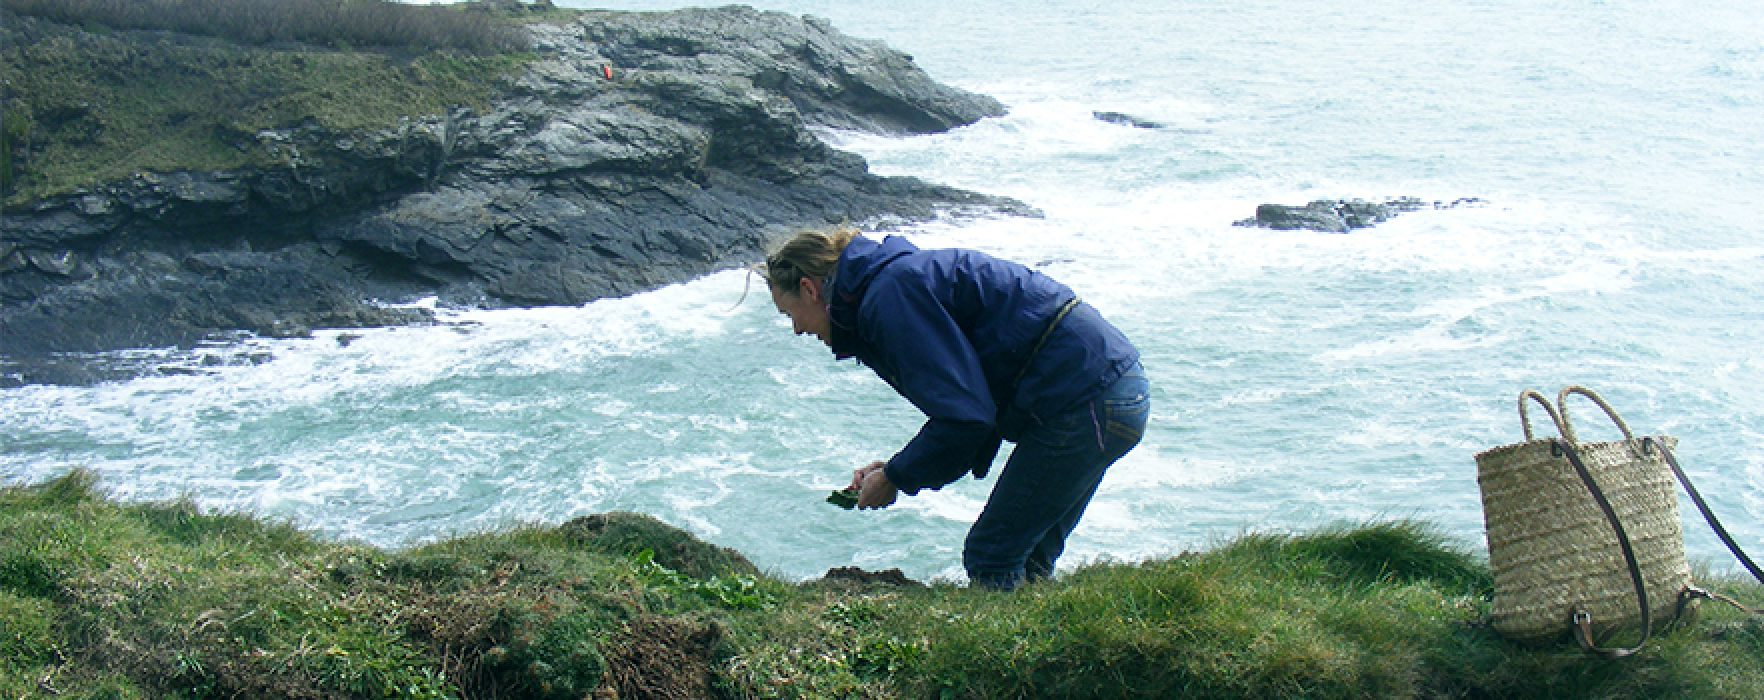 Cornwall, exploring the South Coast